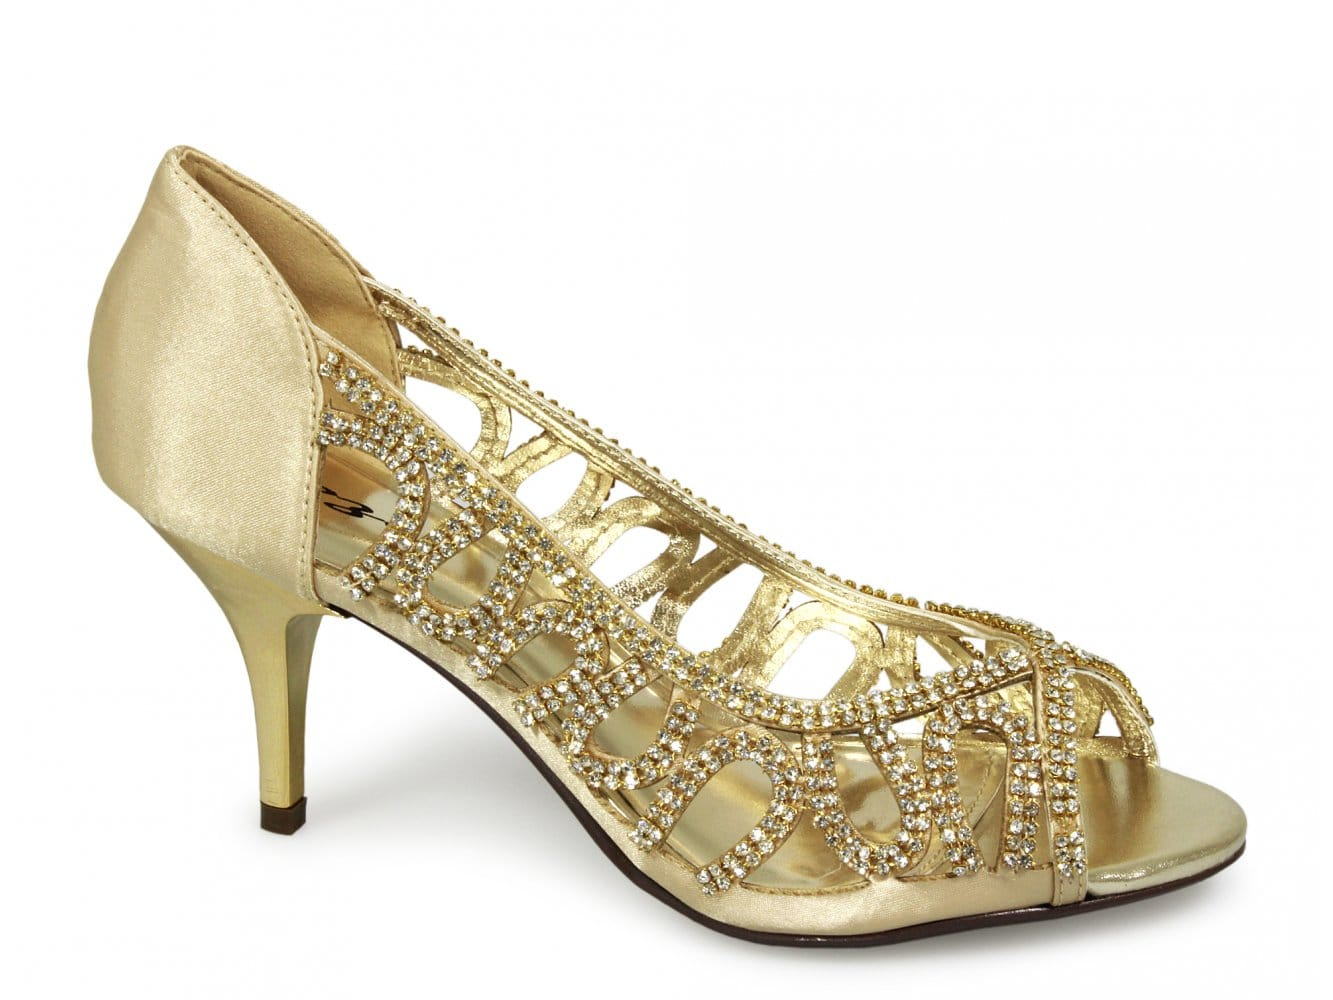 Gold Kitten Heel Shoes Uk